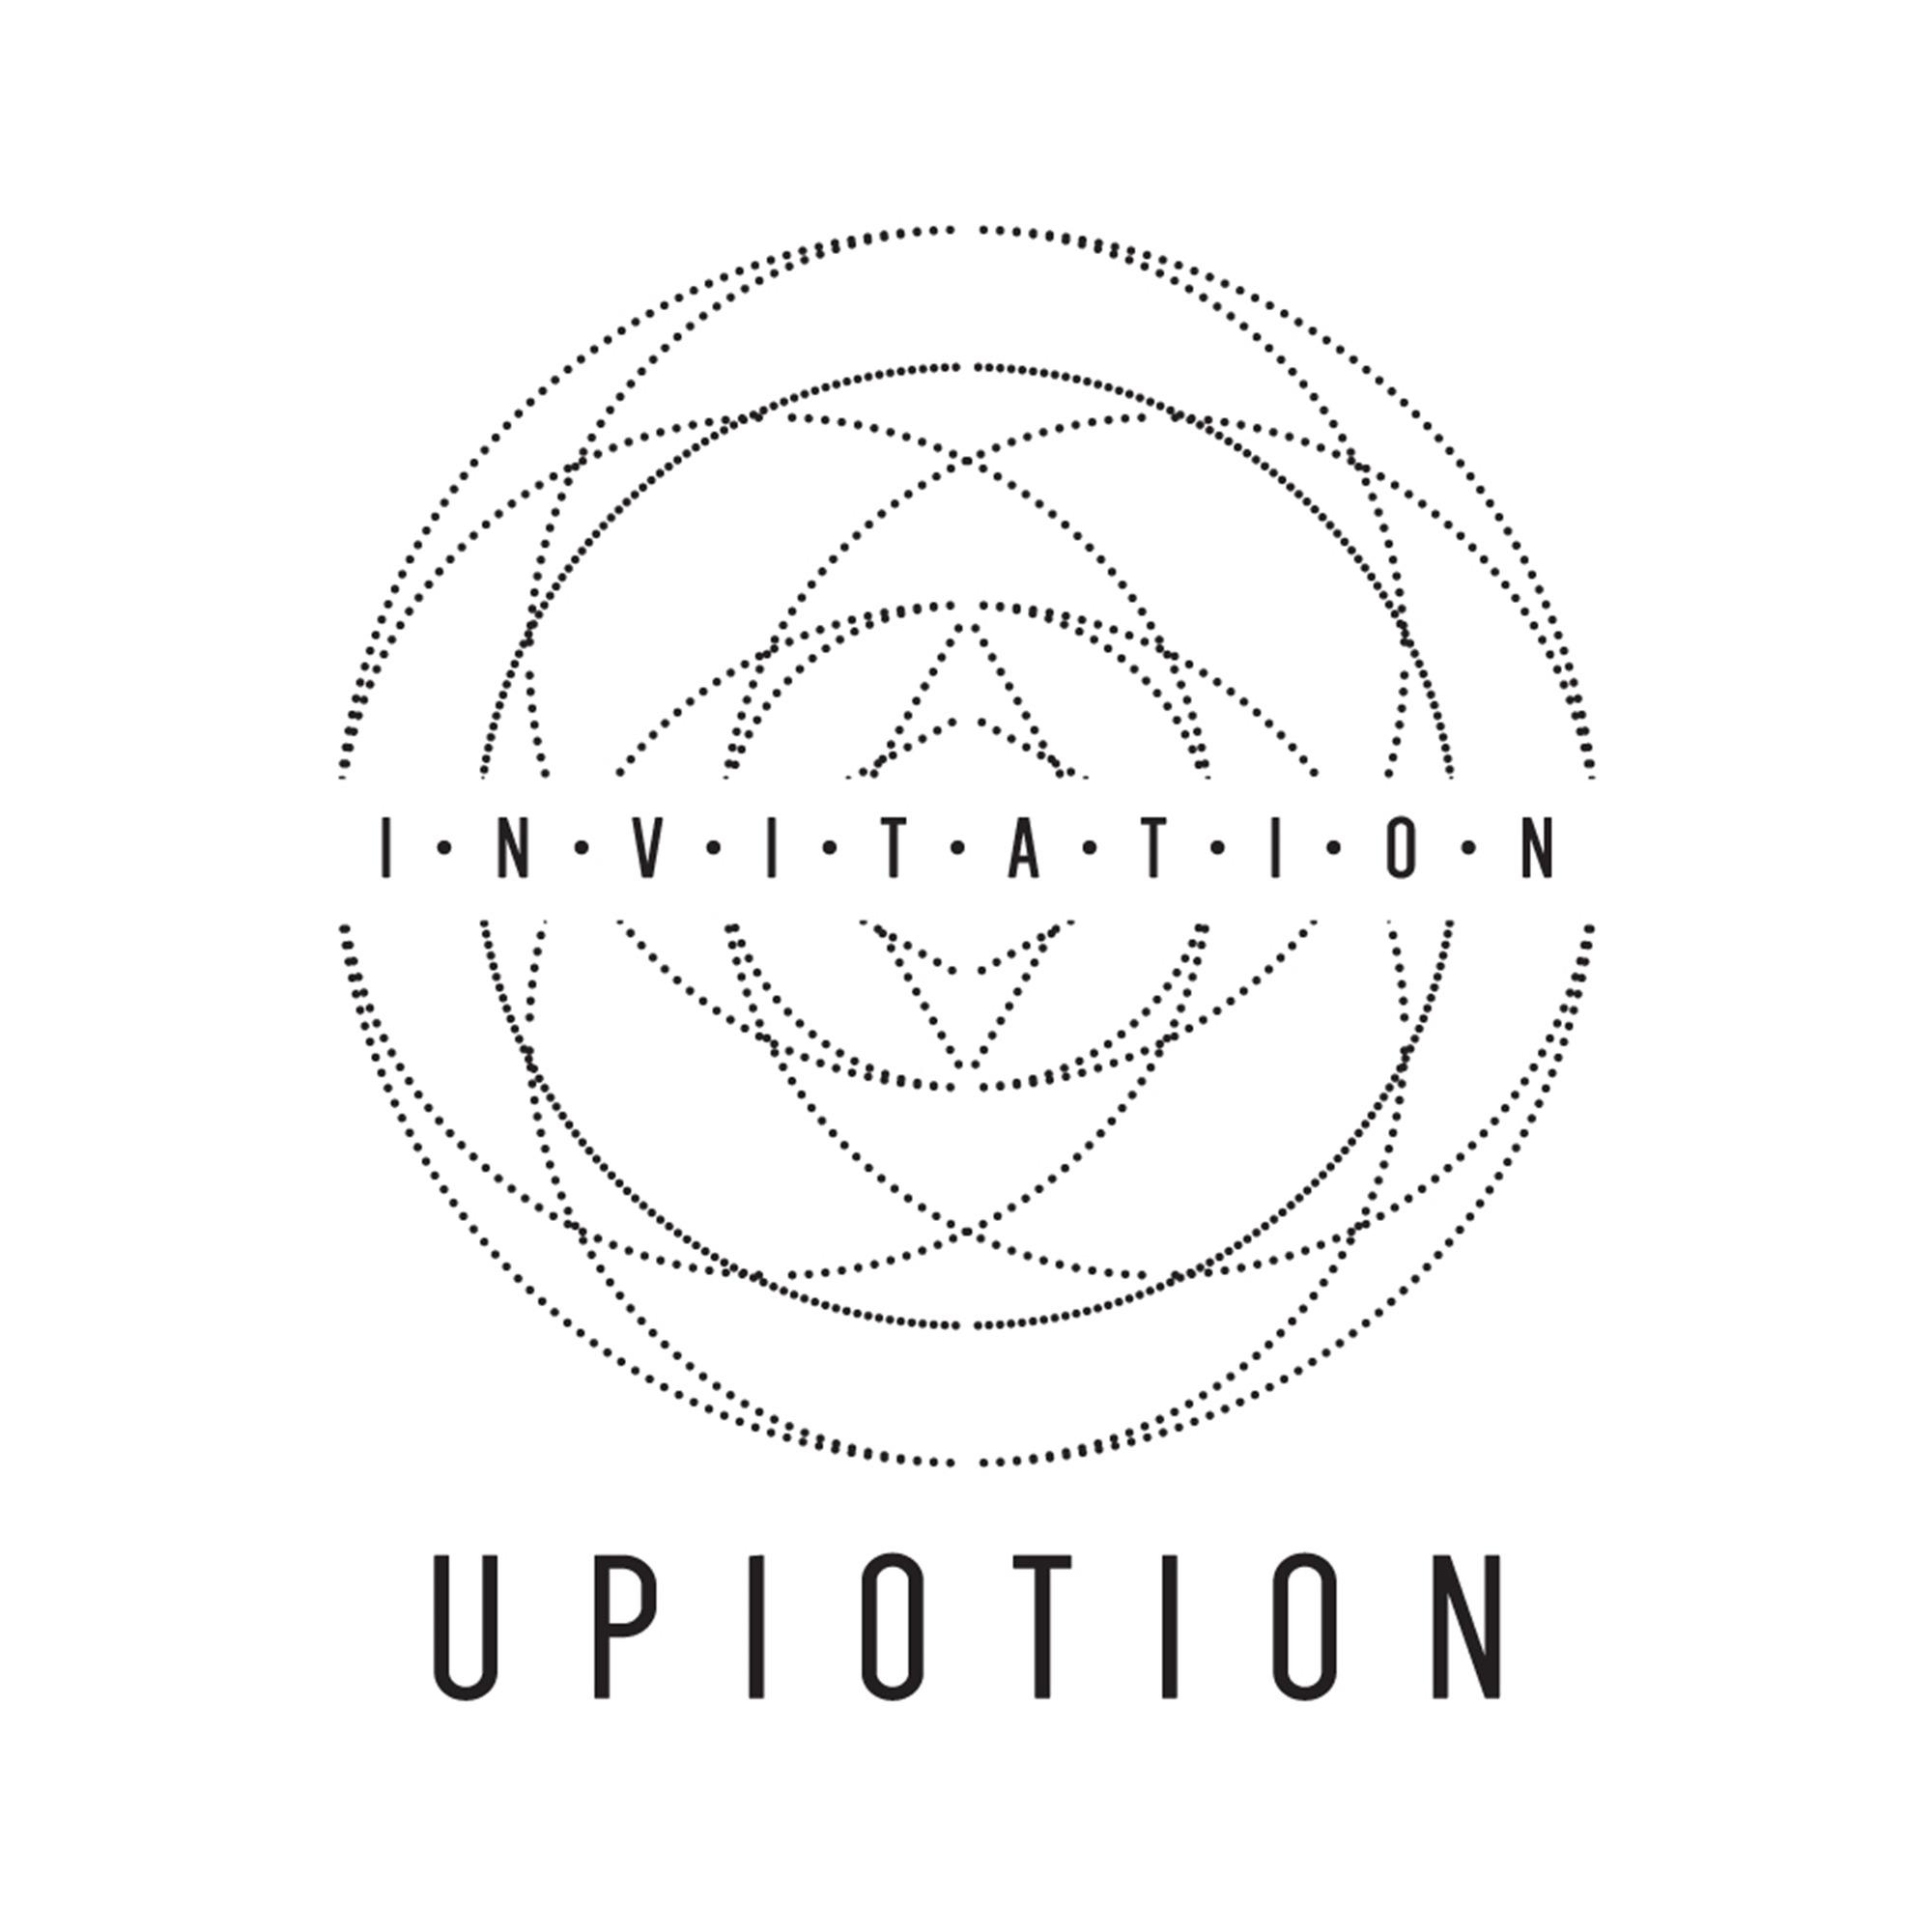 Invitation (UP10TION)